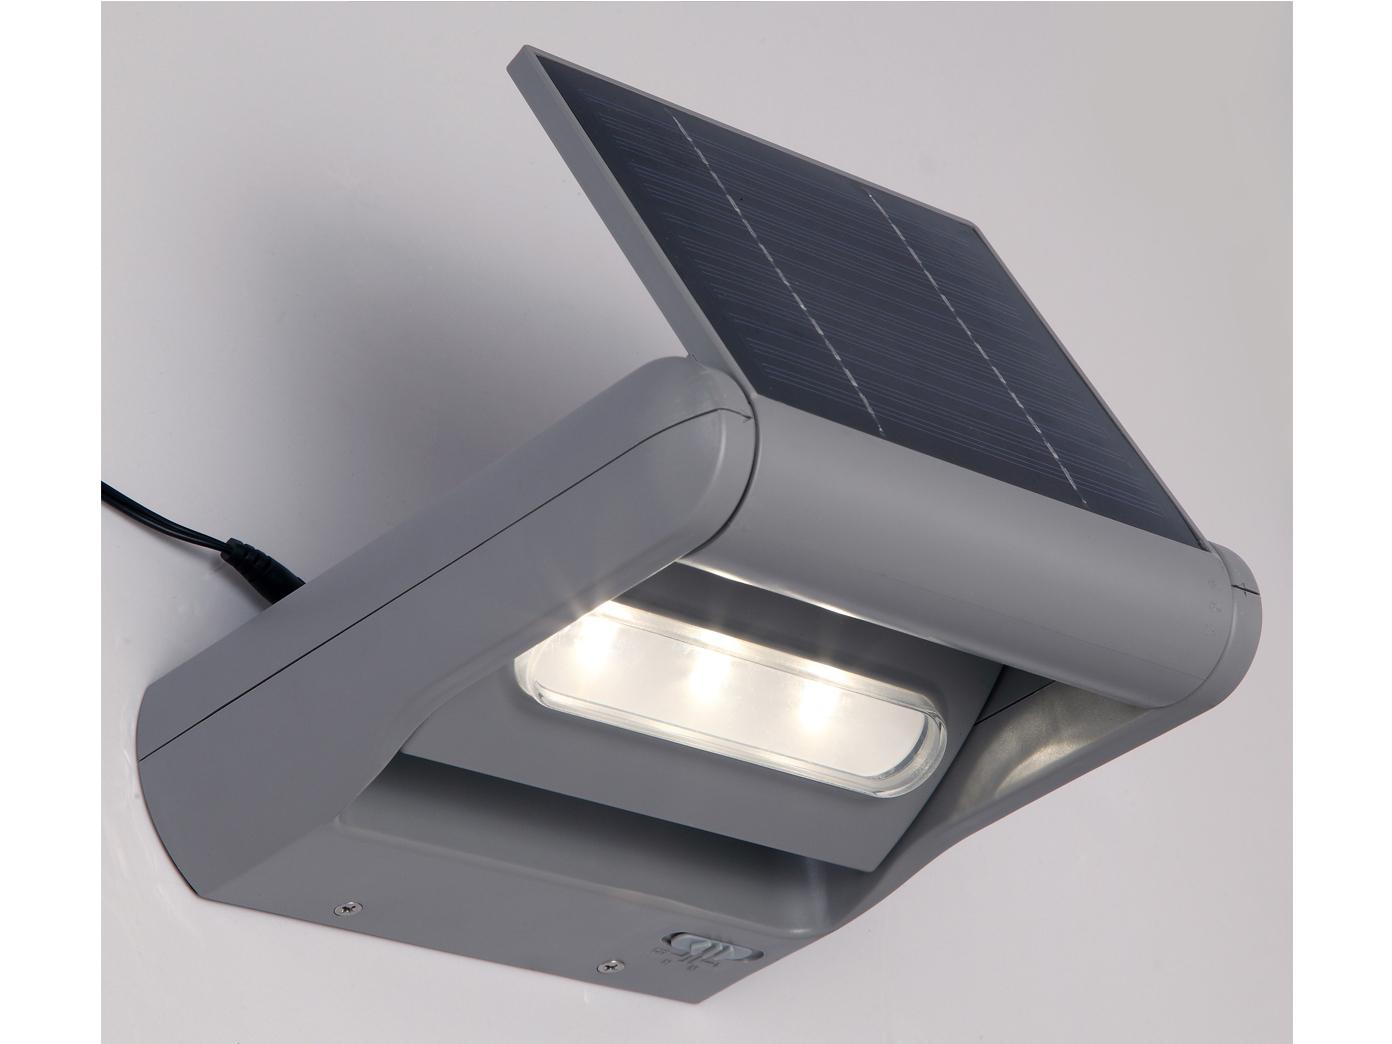 Solarleuchte mit dimmbar LED drehbar IP44 Wandleuchte Außenleuchte Gartenlicht Gartenlicht Gartenlicht 1ee79f